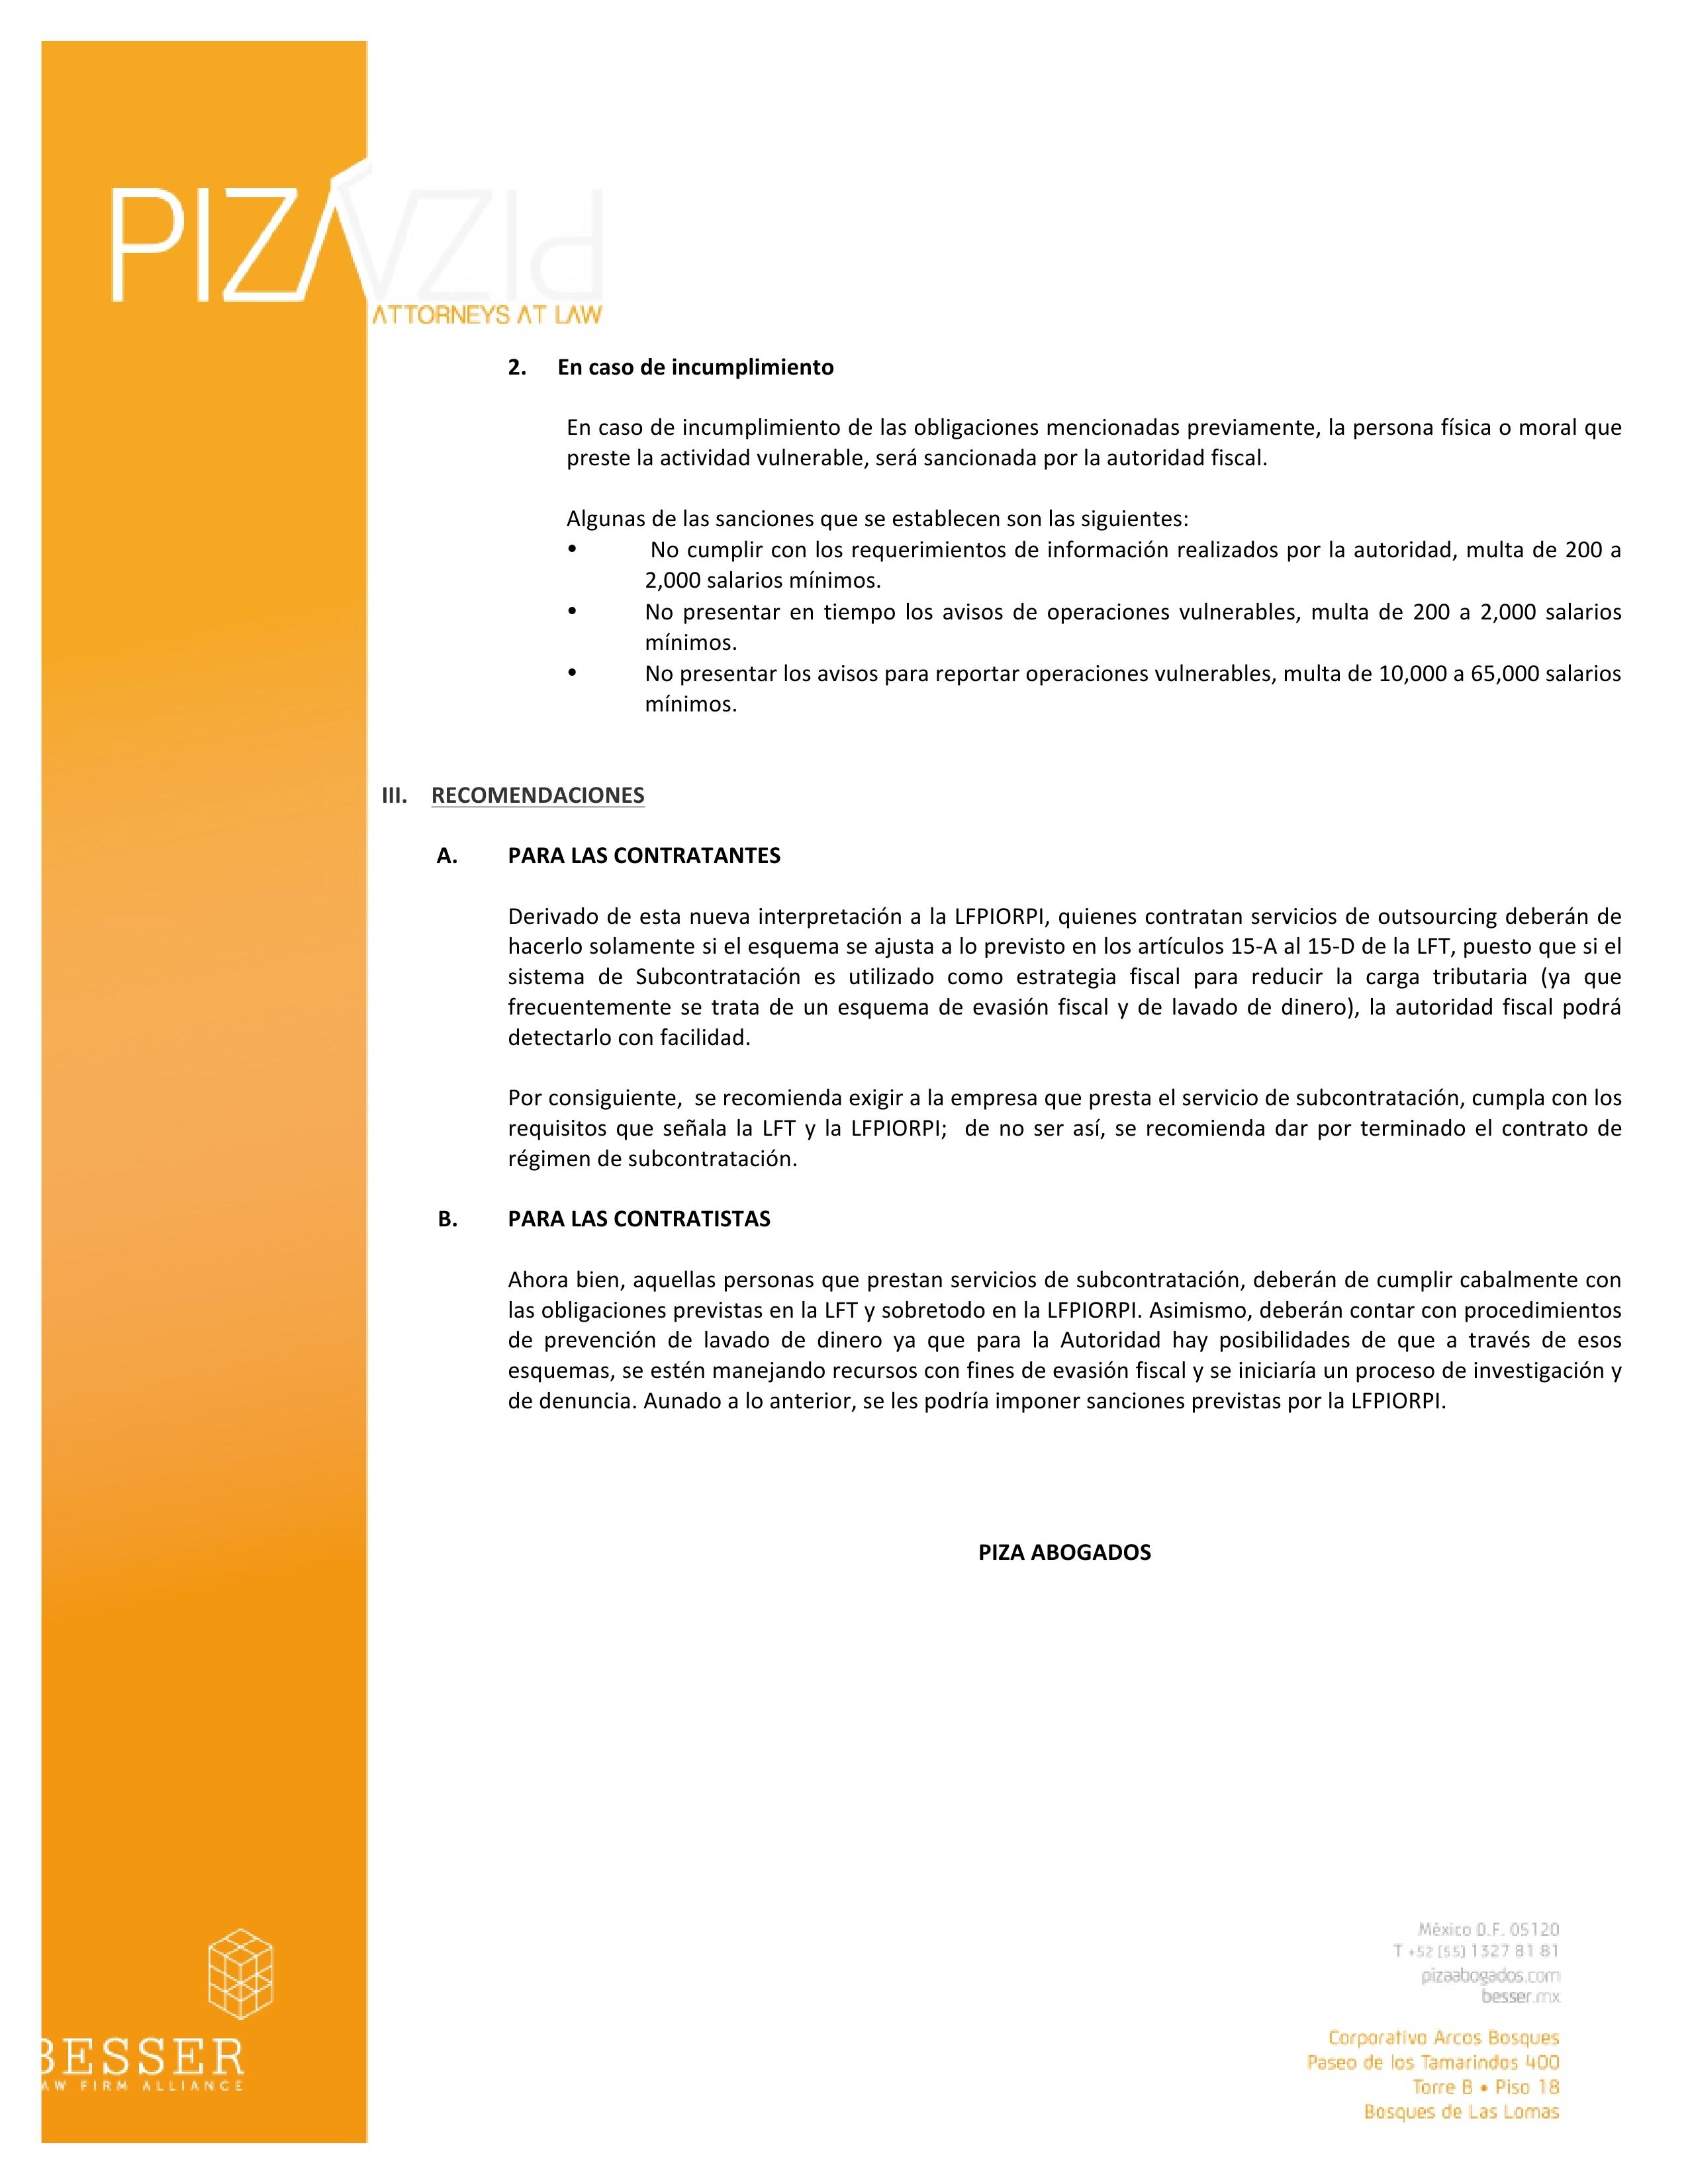 Outsourcing_como_actividad_vulnerable.pdf_page_4